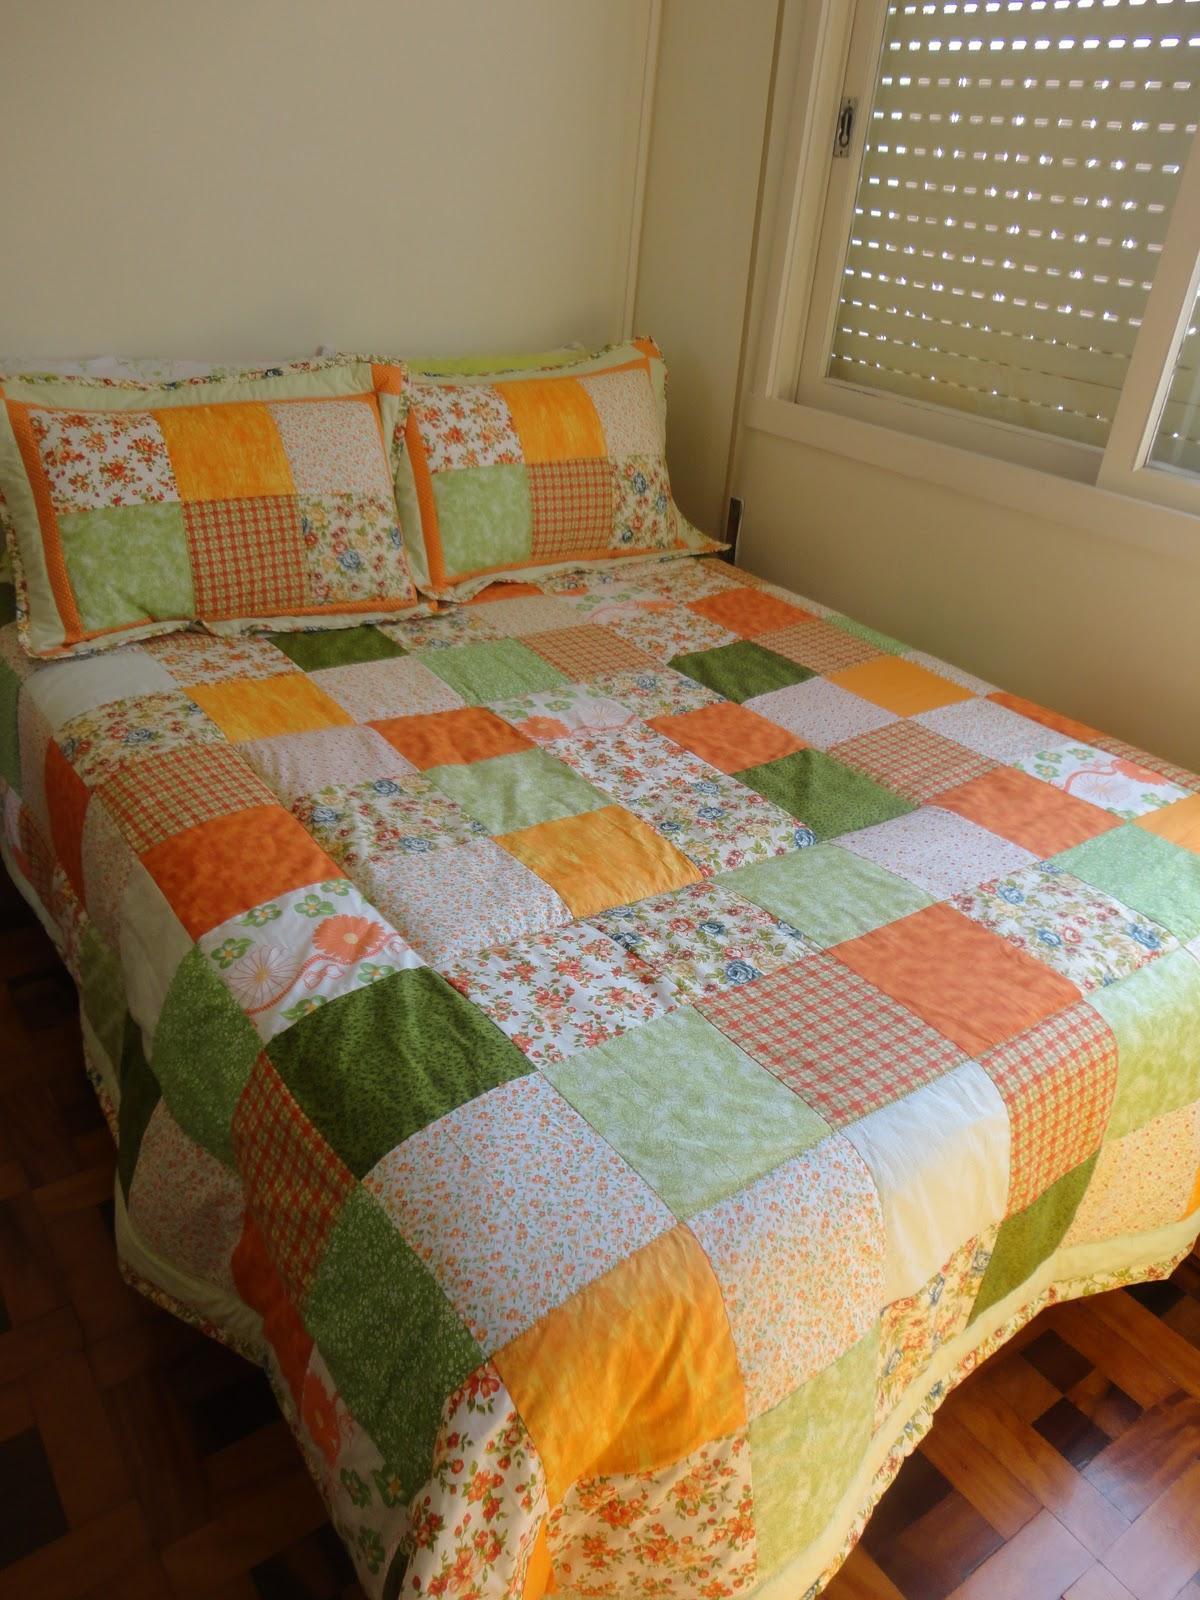 Camila kezo patchwork colcha de patchwork - Colchas de patchwork hechas a mano ...